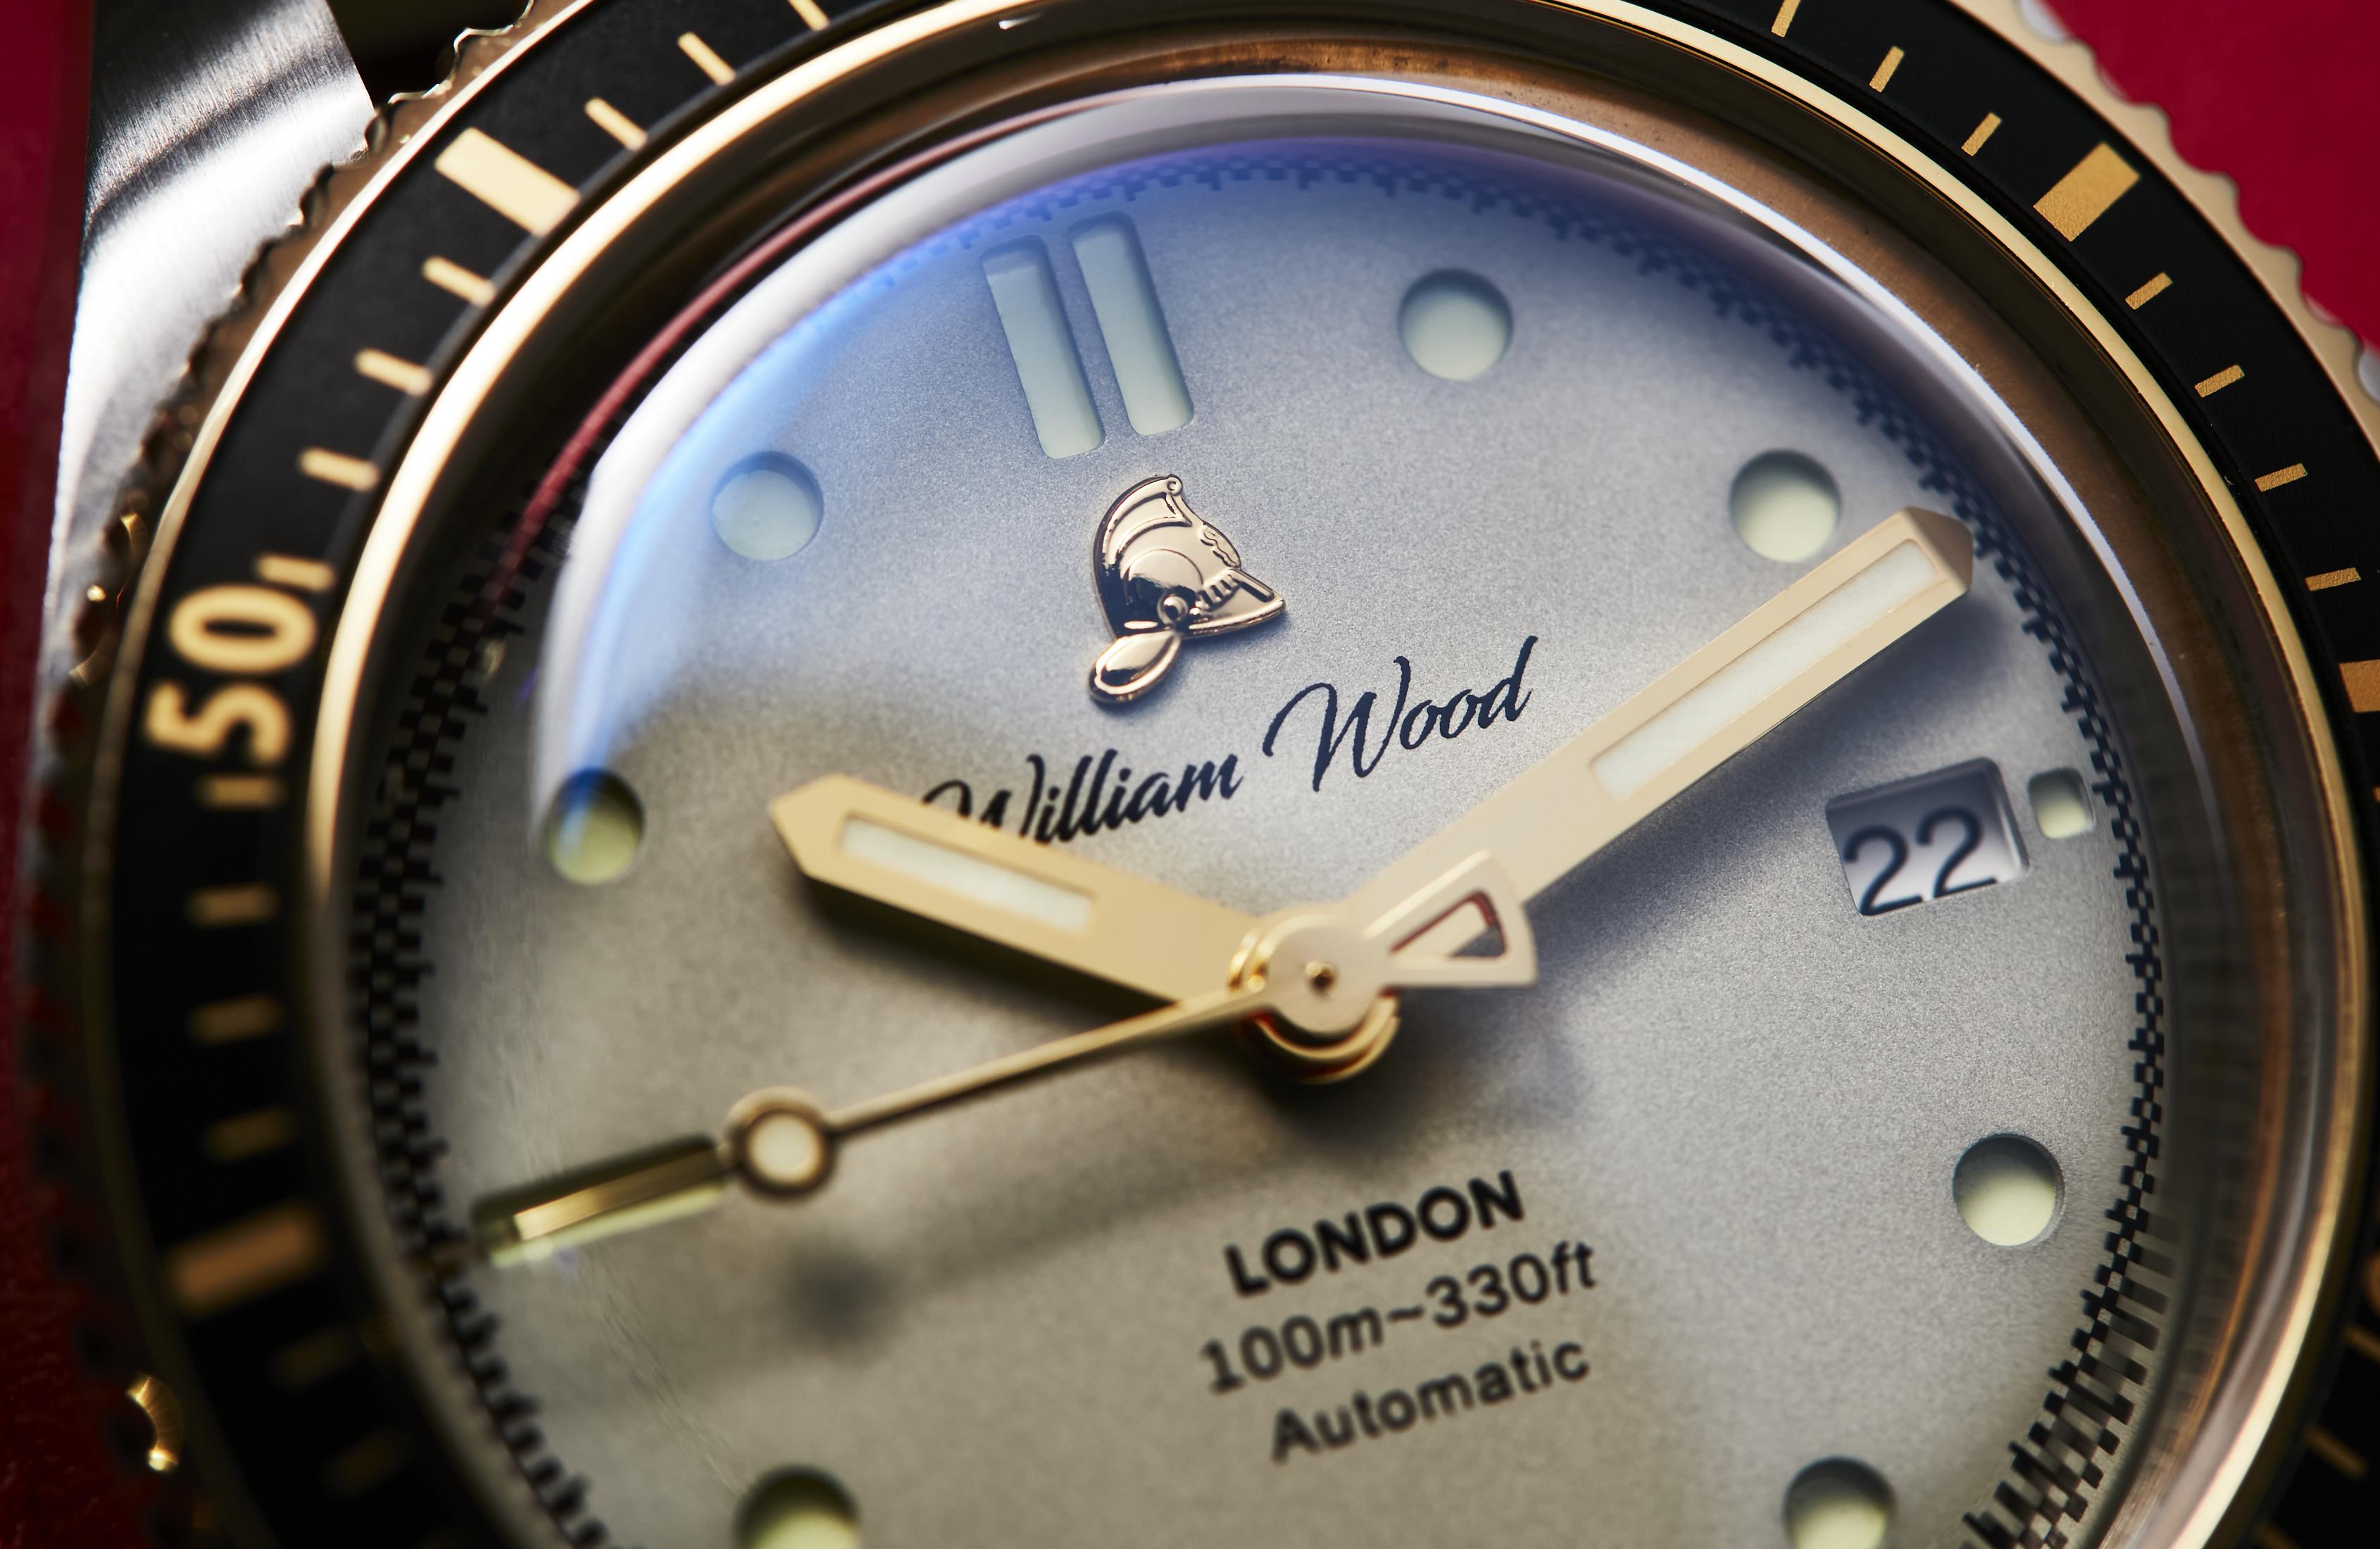 William Wood Valiant White review